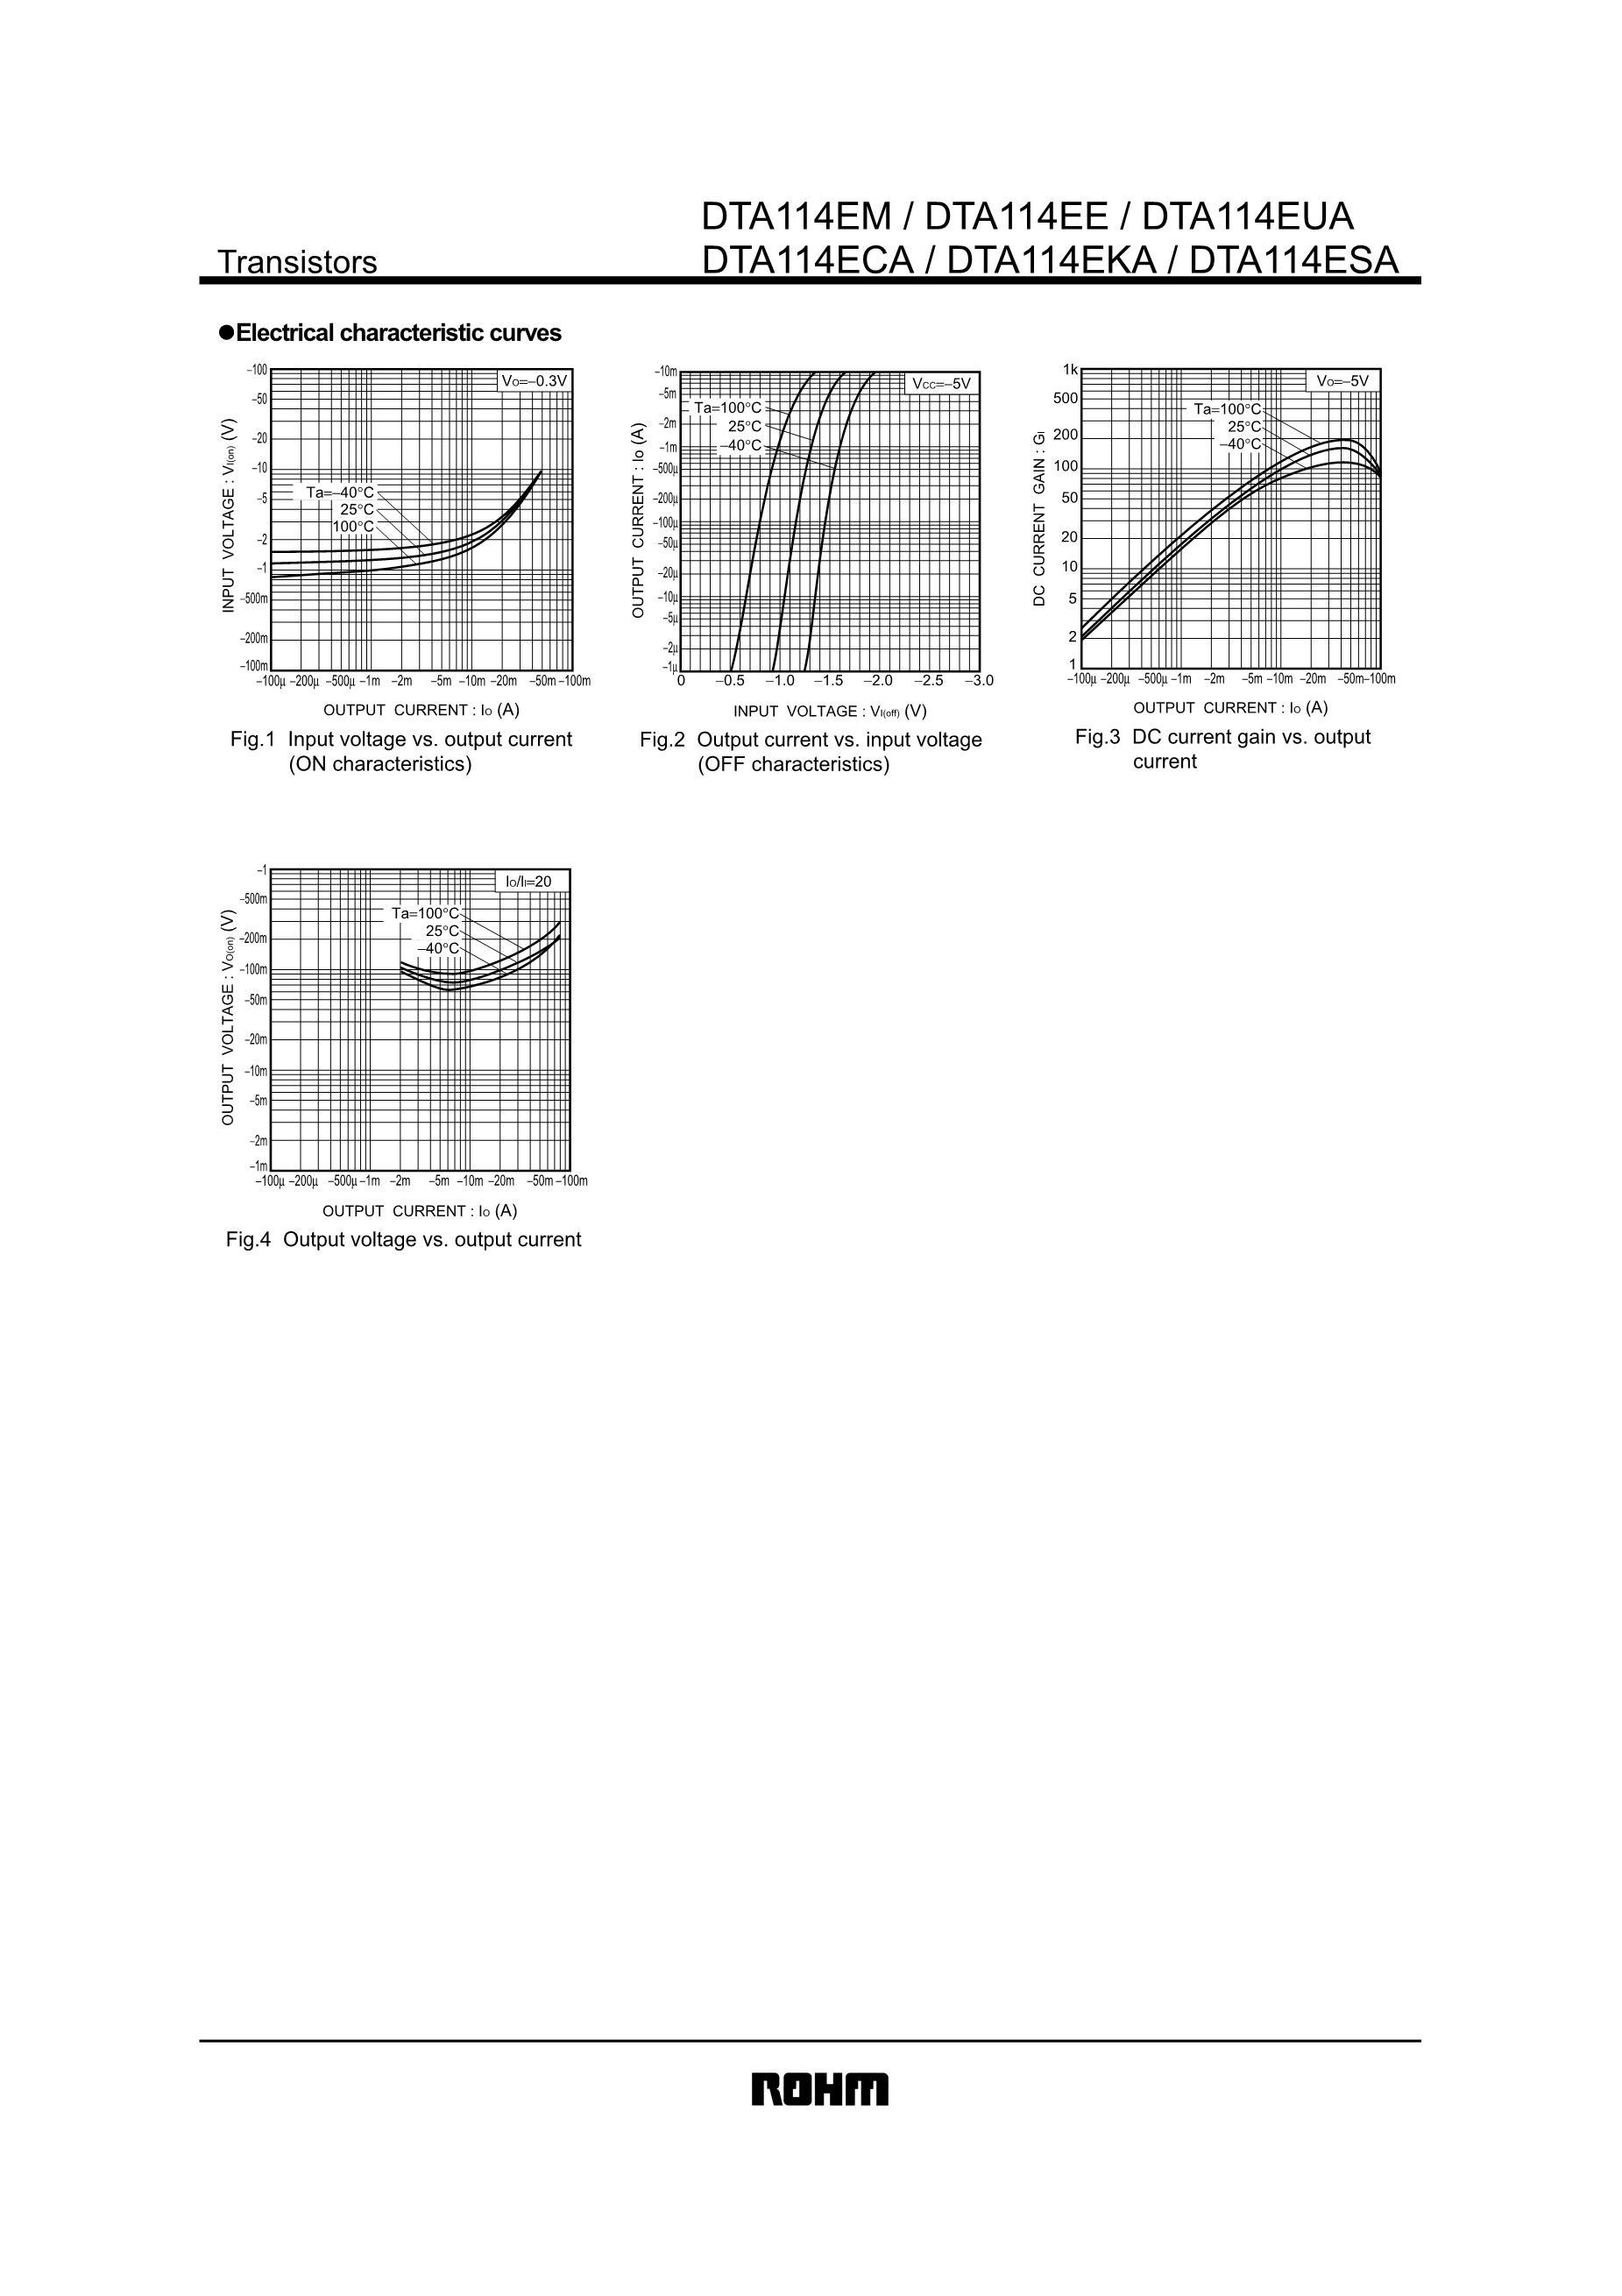 DTA143TU's pdf picture 3